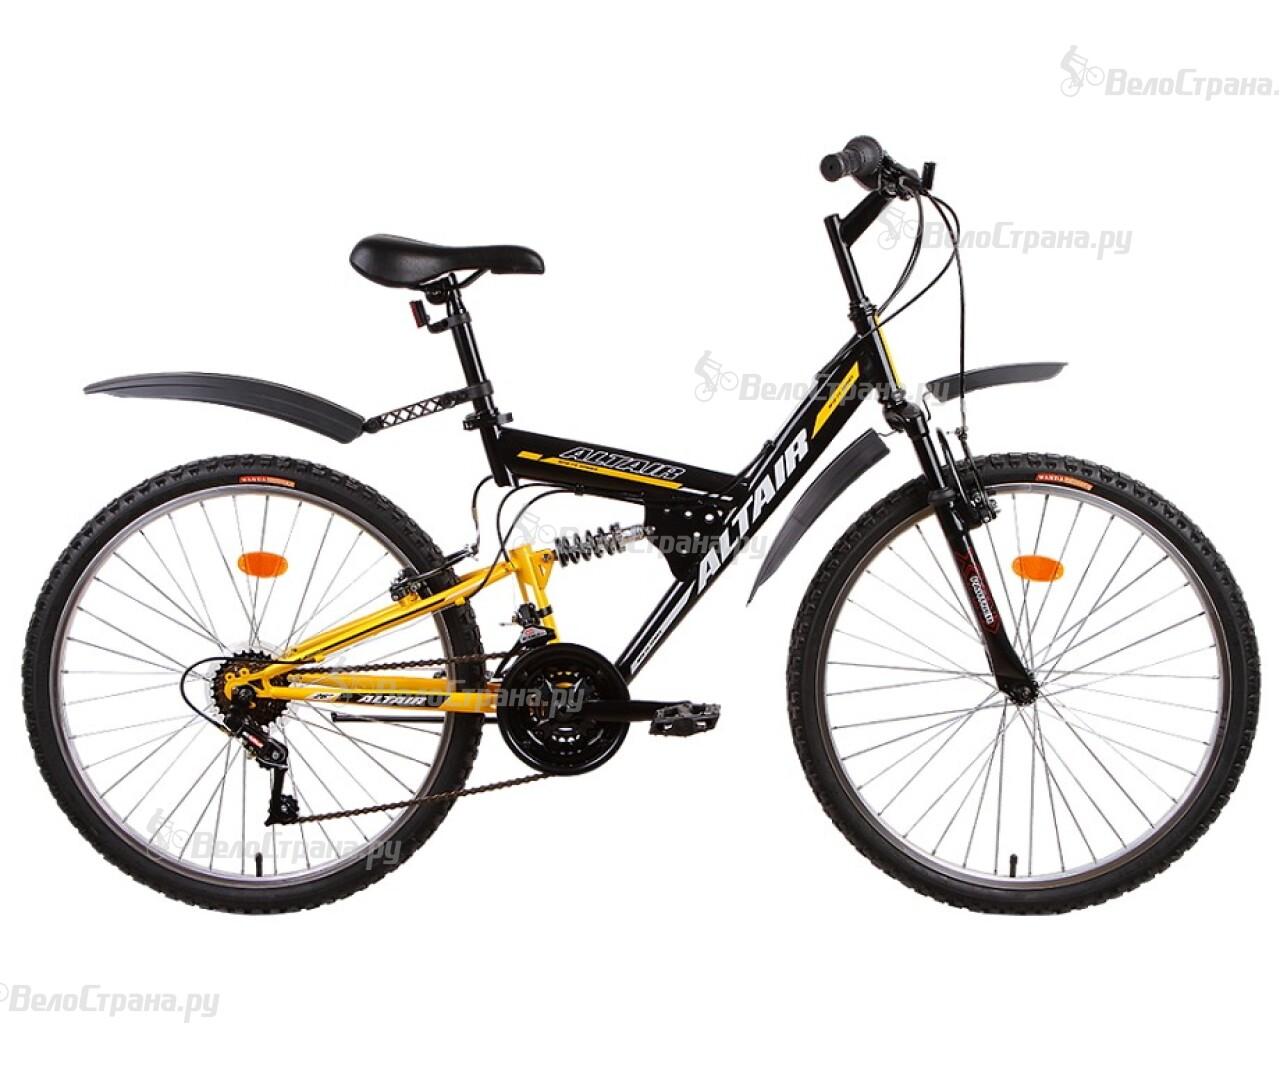 Велосипед Forward Altair MTB FS 26 (2014) велосипед forward altair mtb ht 26 2015